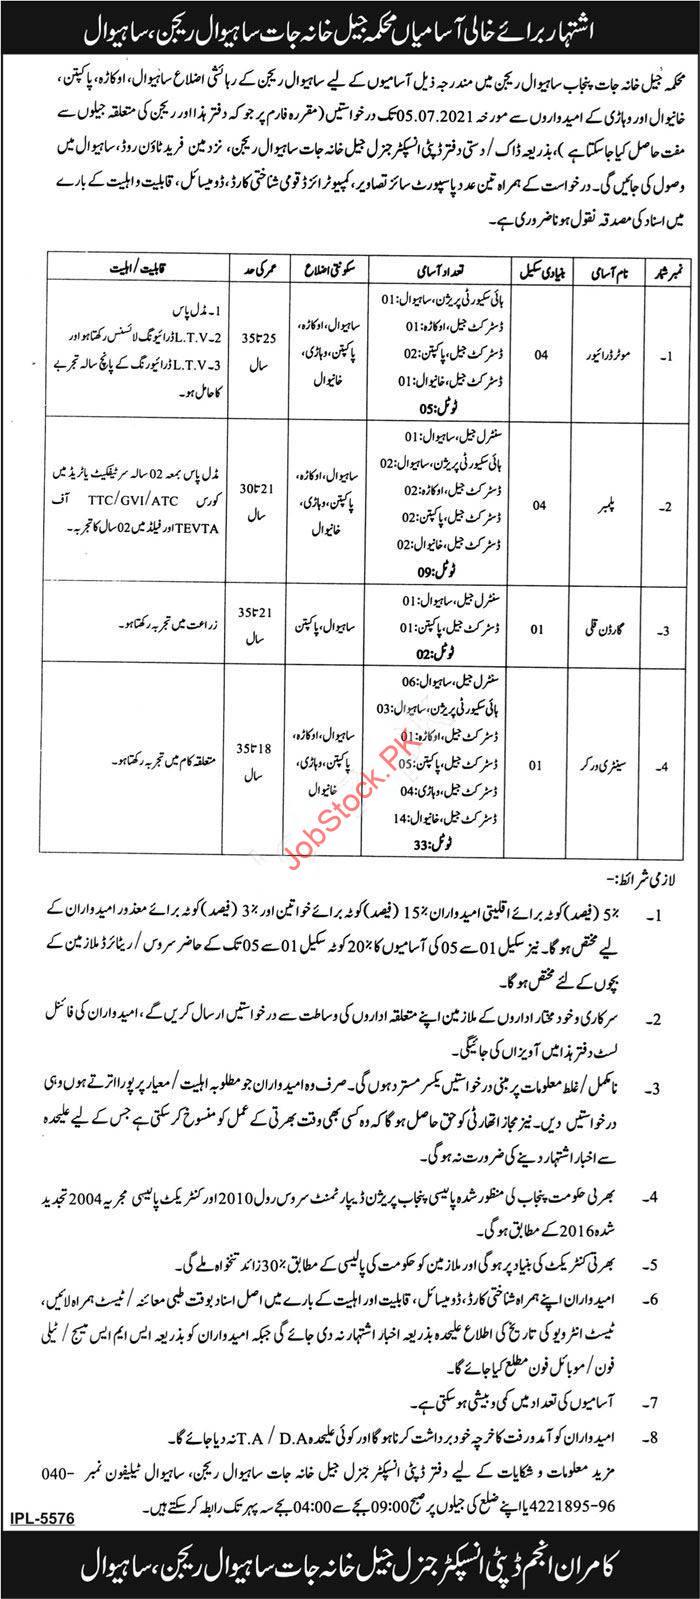 Punjab Jail Department Jobs 2021 Advertisement